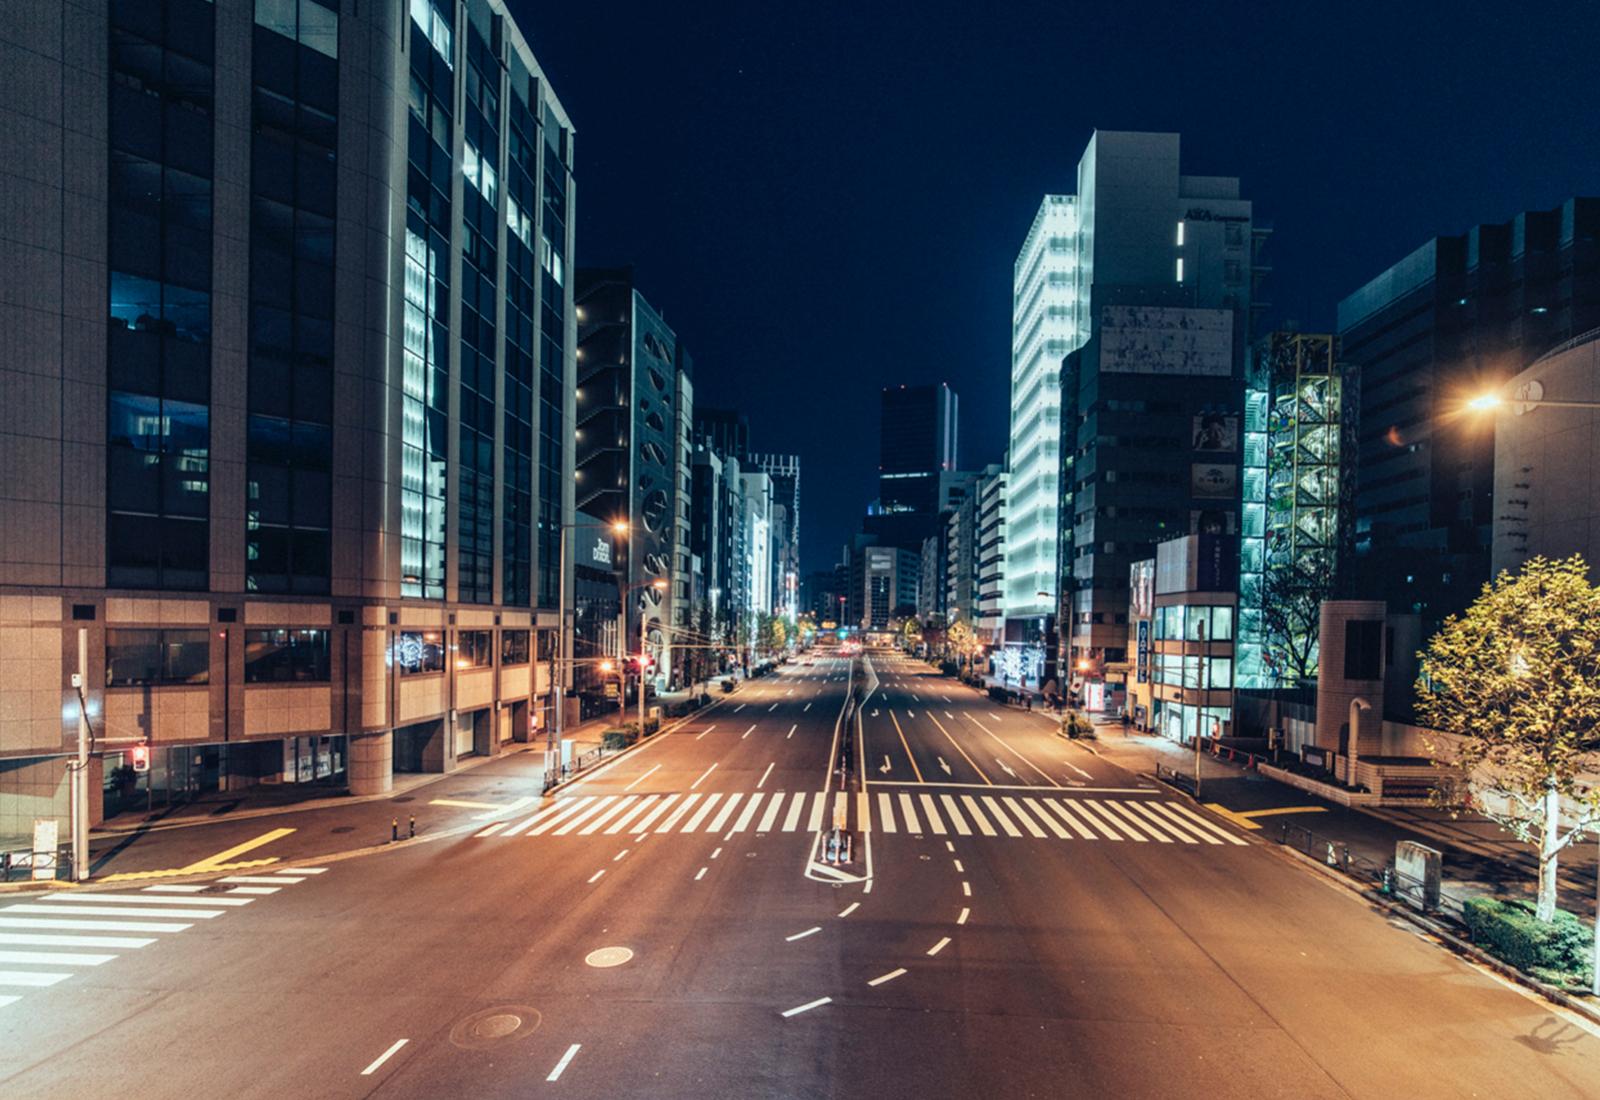 "ville deserte japon tokyo genaro bardy ville photo art - ""Desert in the city"" : Genaro Bardy photographie Tokyo vidée de ses habitants"